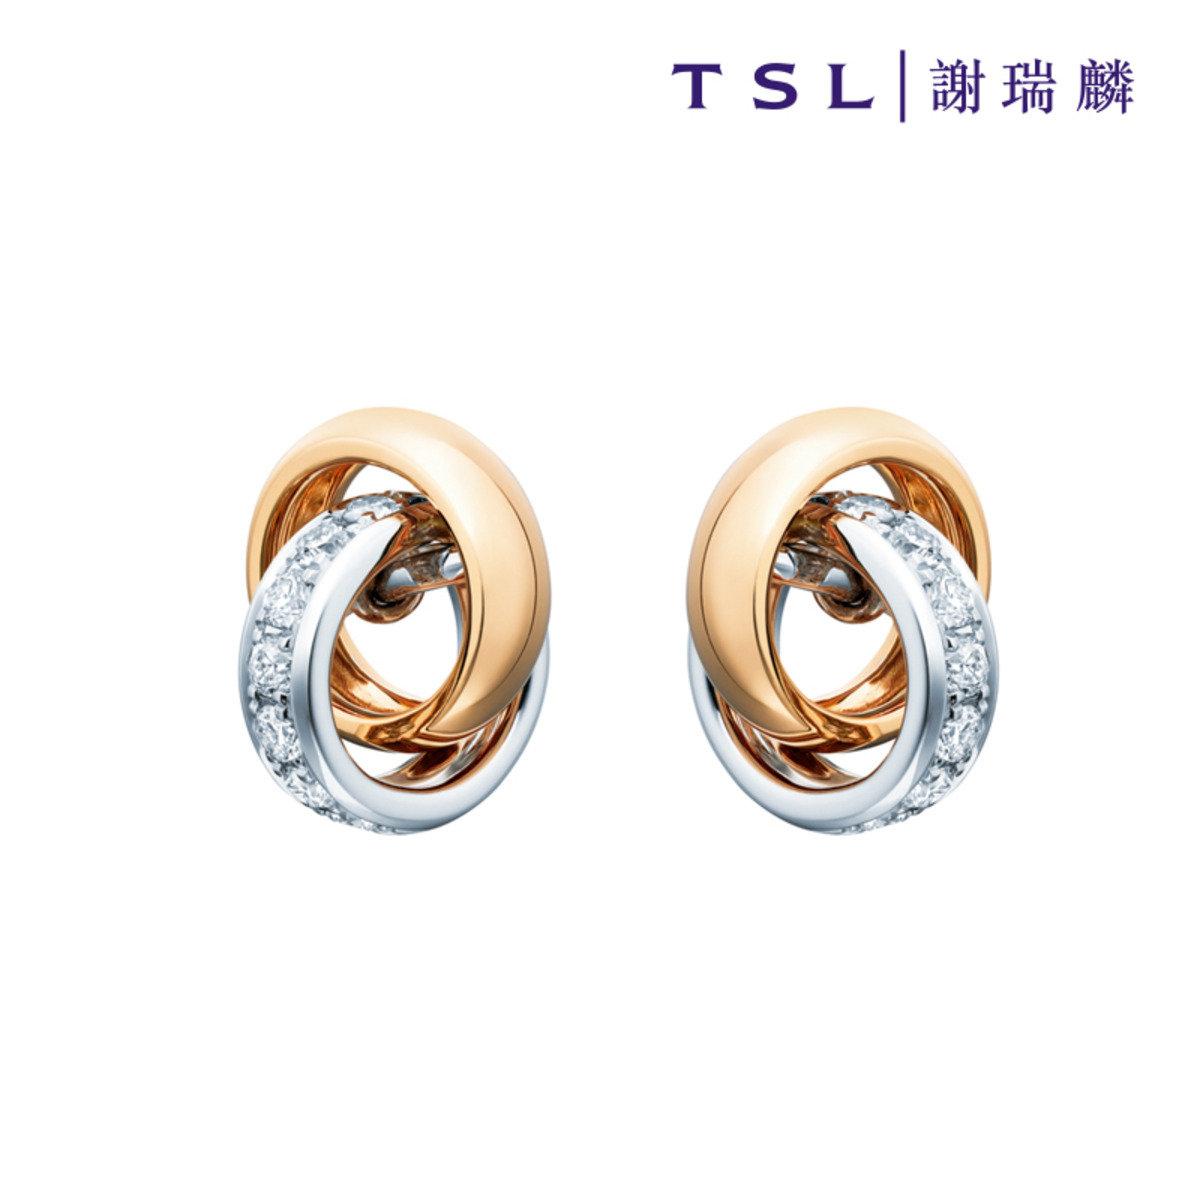 750/18K金鑲天然鑽石耳環